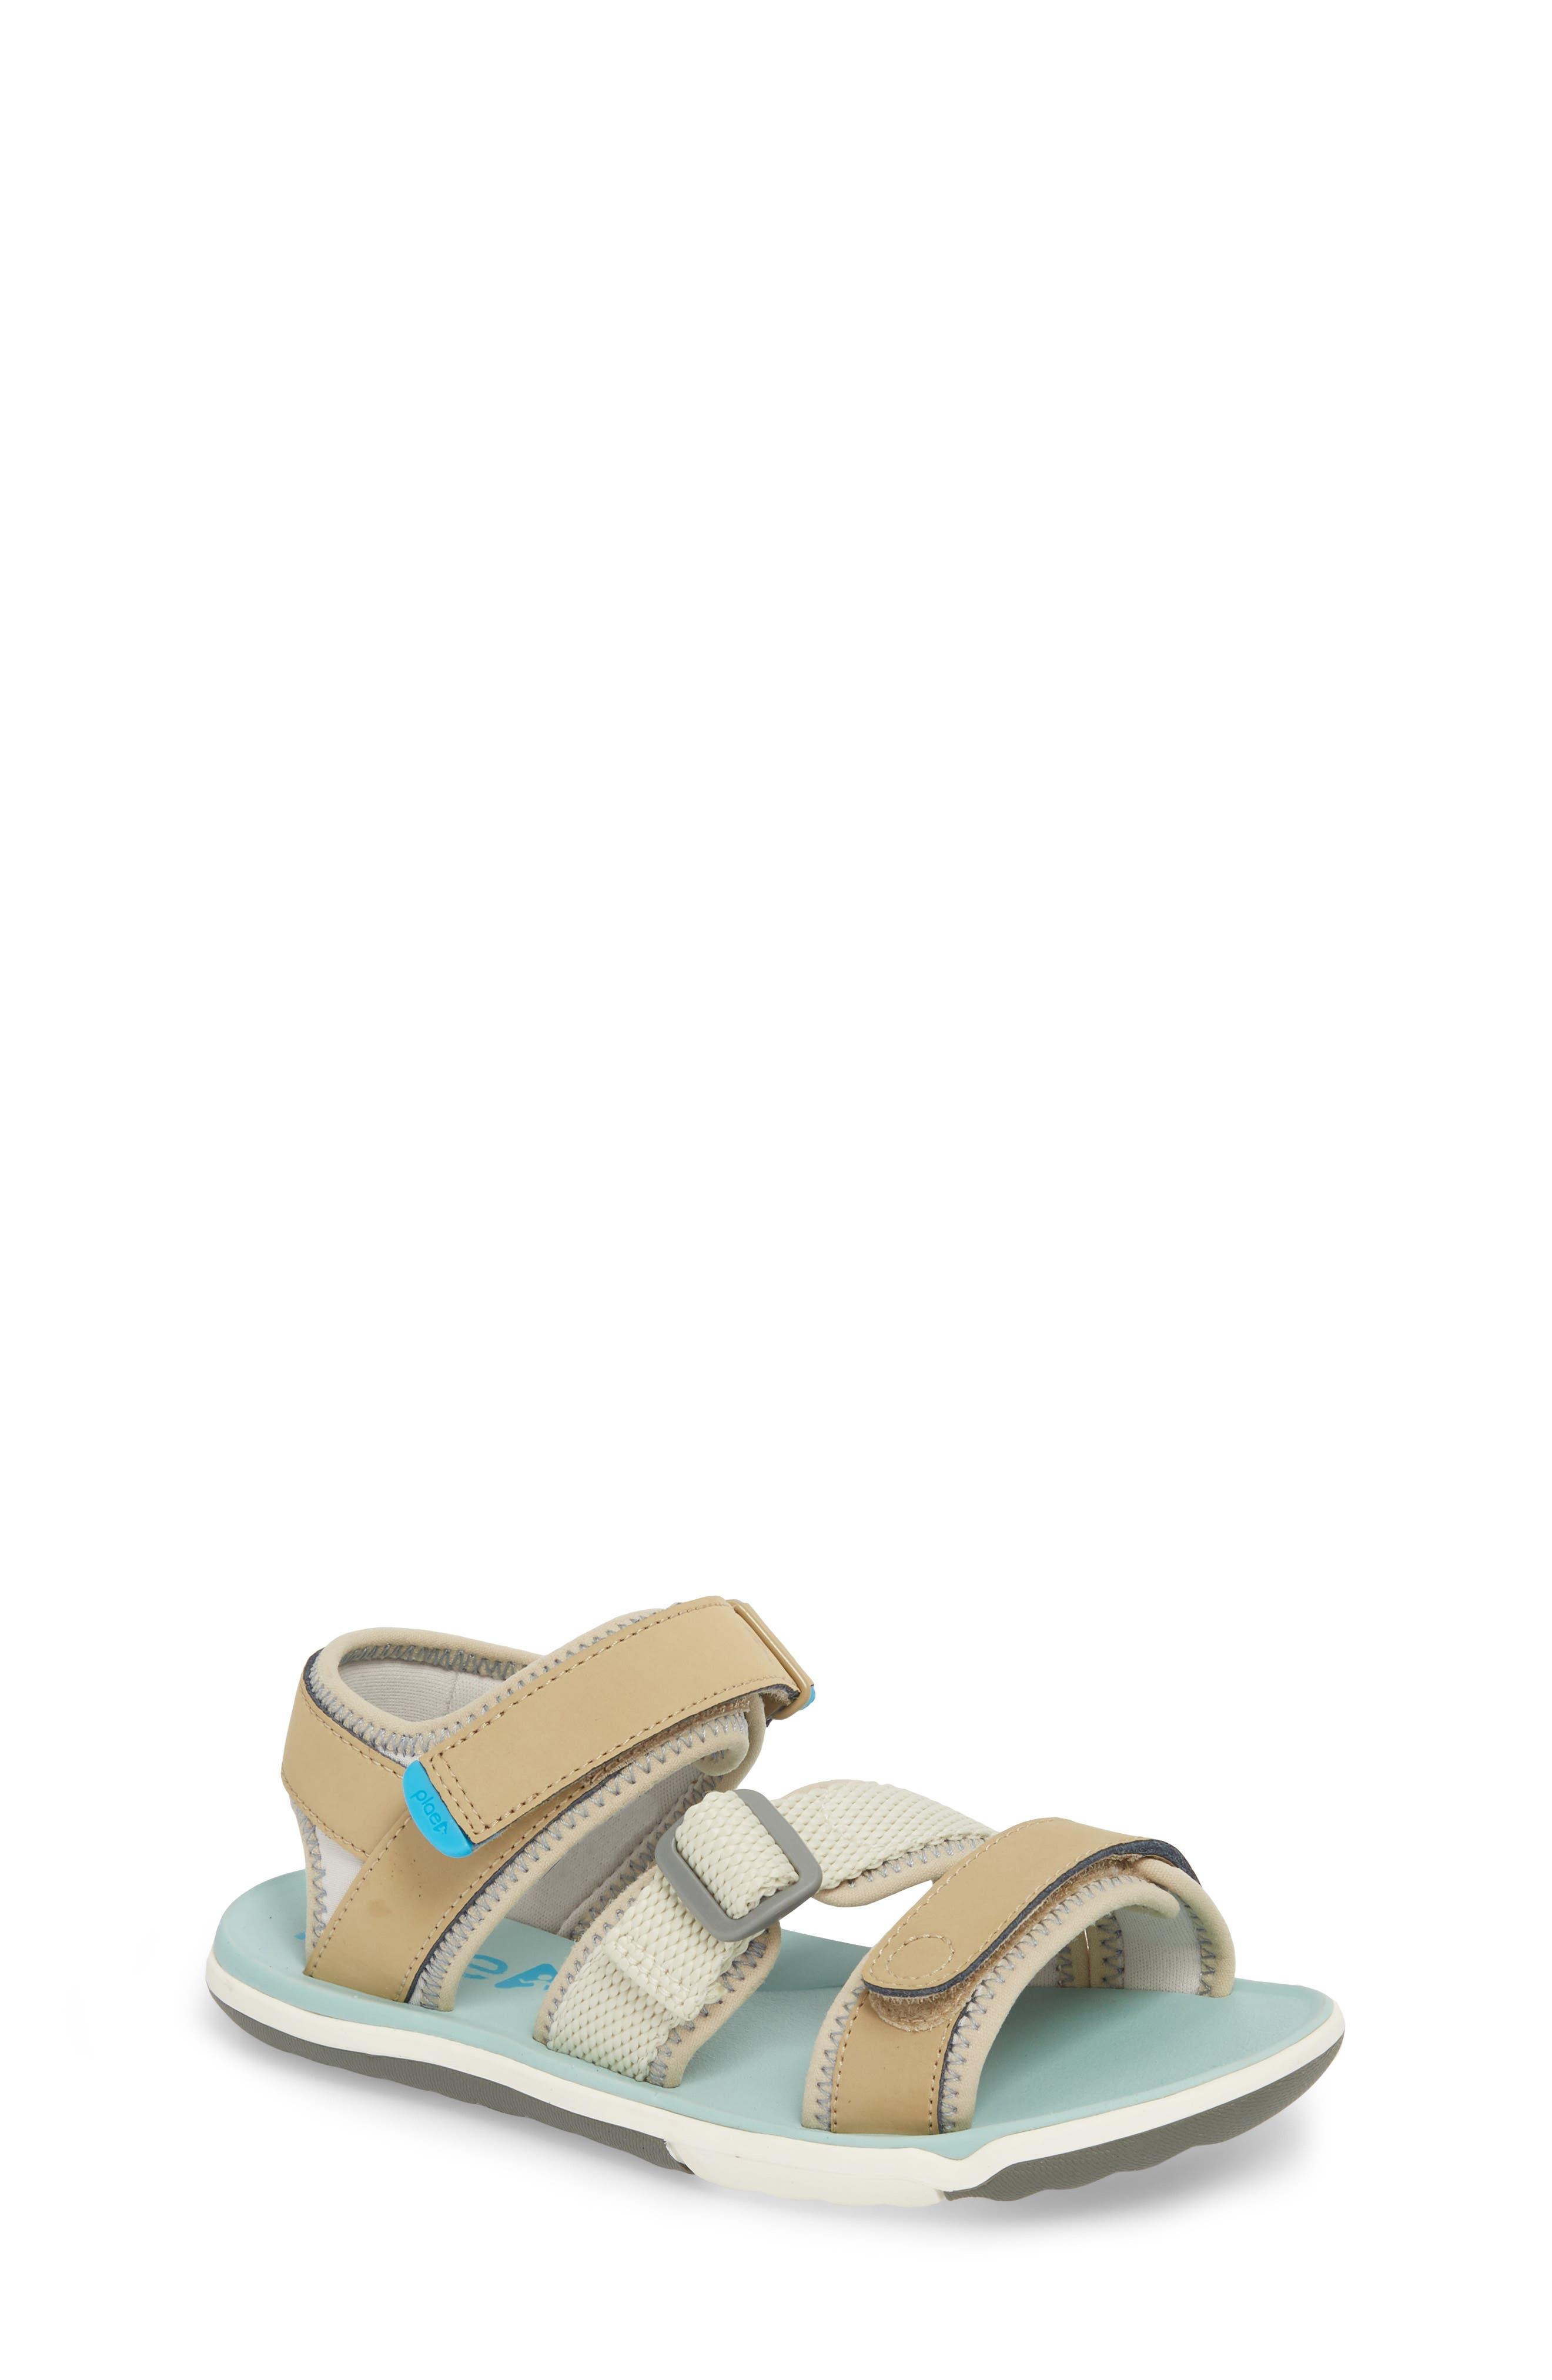 Wes Customizable Sandal,                         Main,                         color, 250